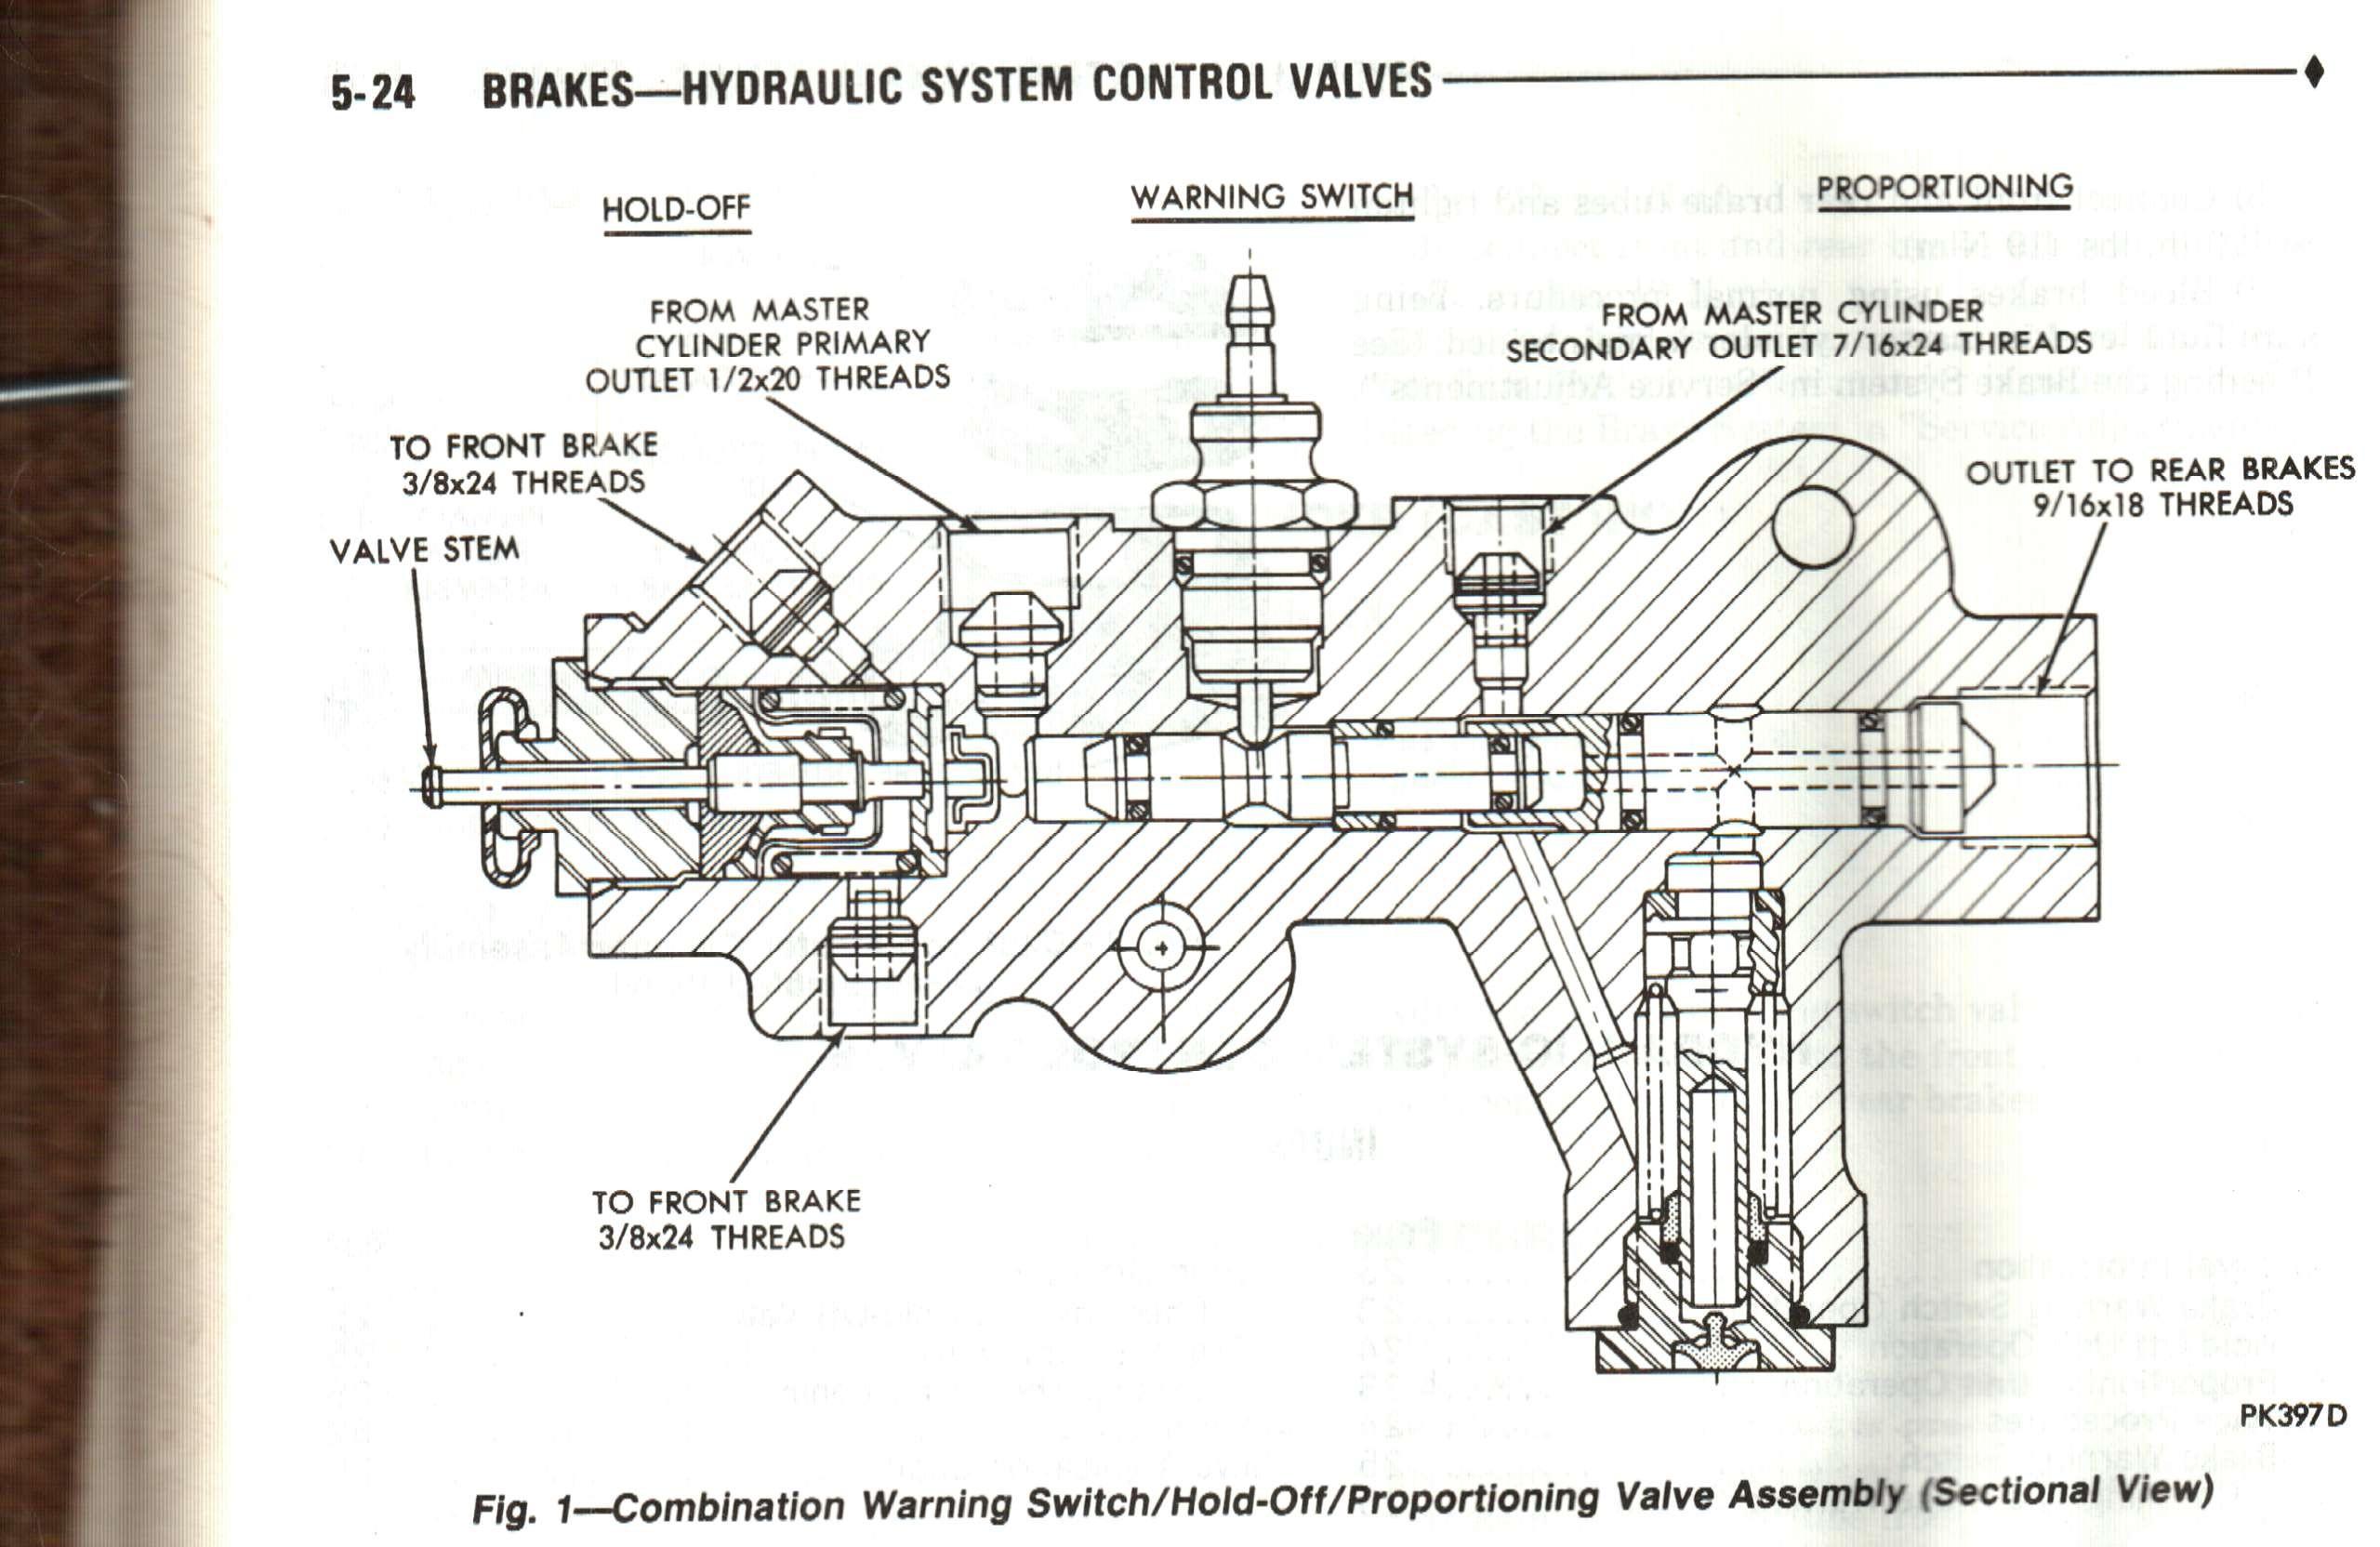 3 Phase Motor Wiring Diagrams Gm Proportioning Valve Diagram My Wiring Diagram